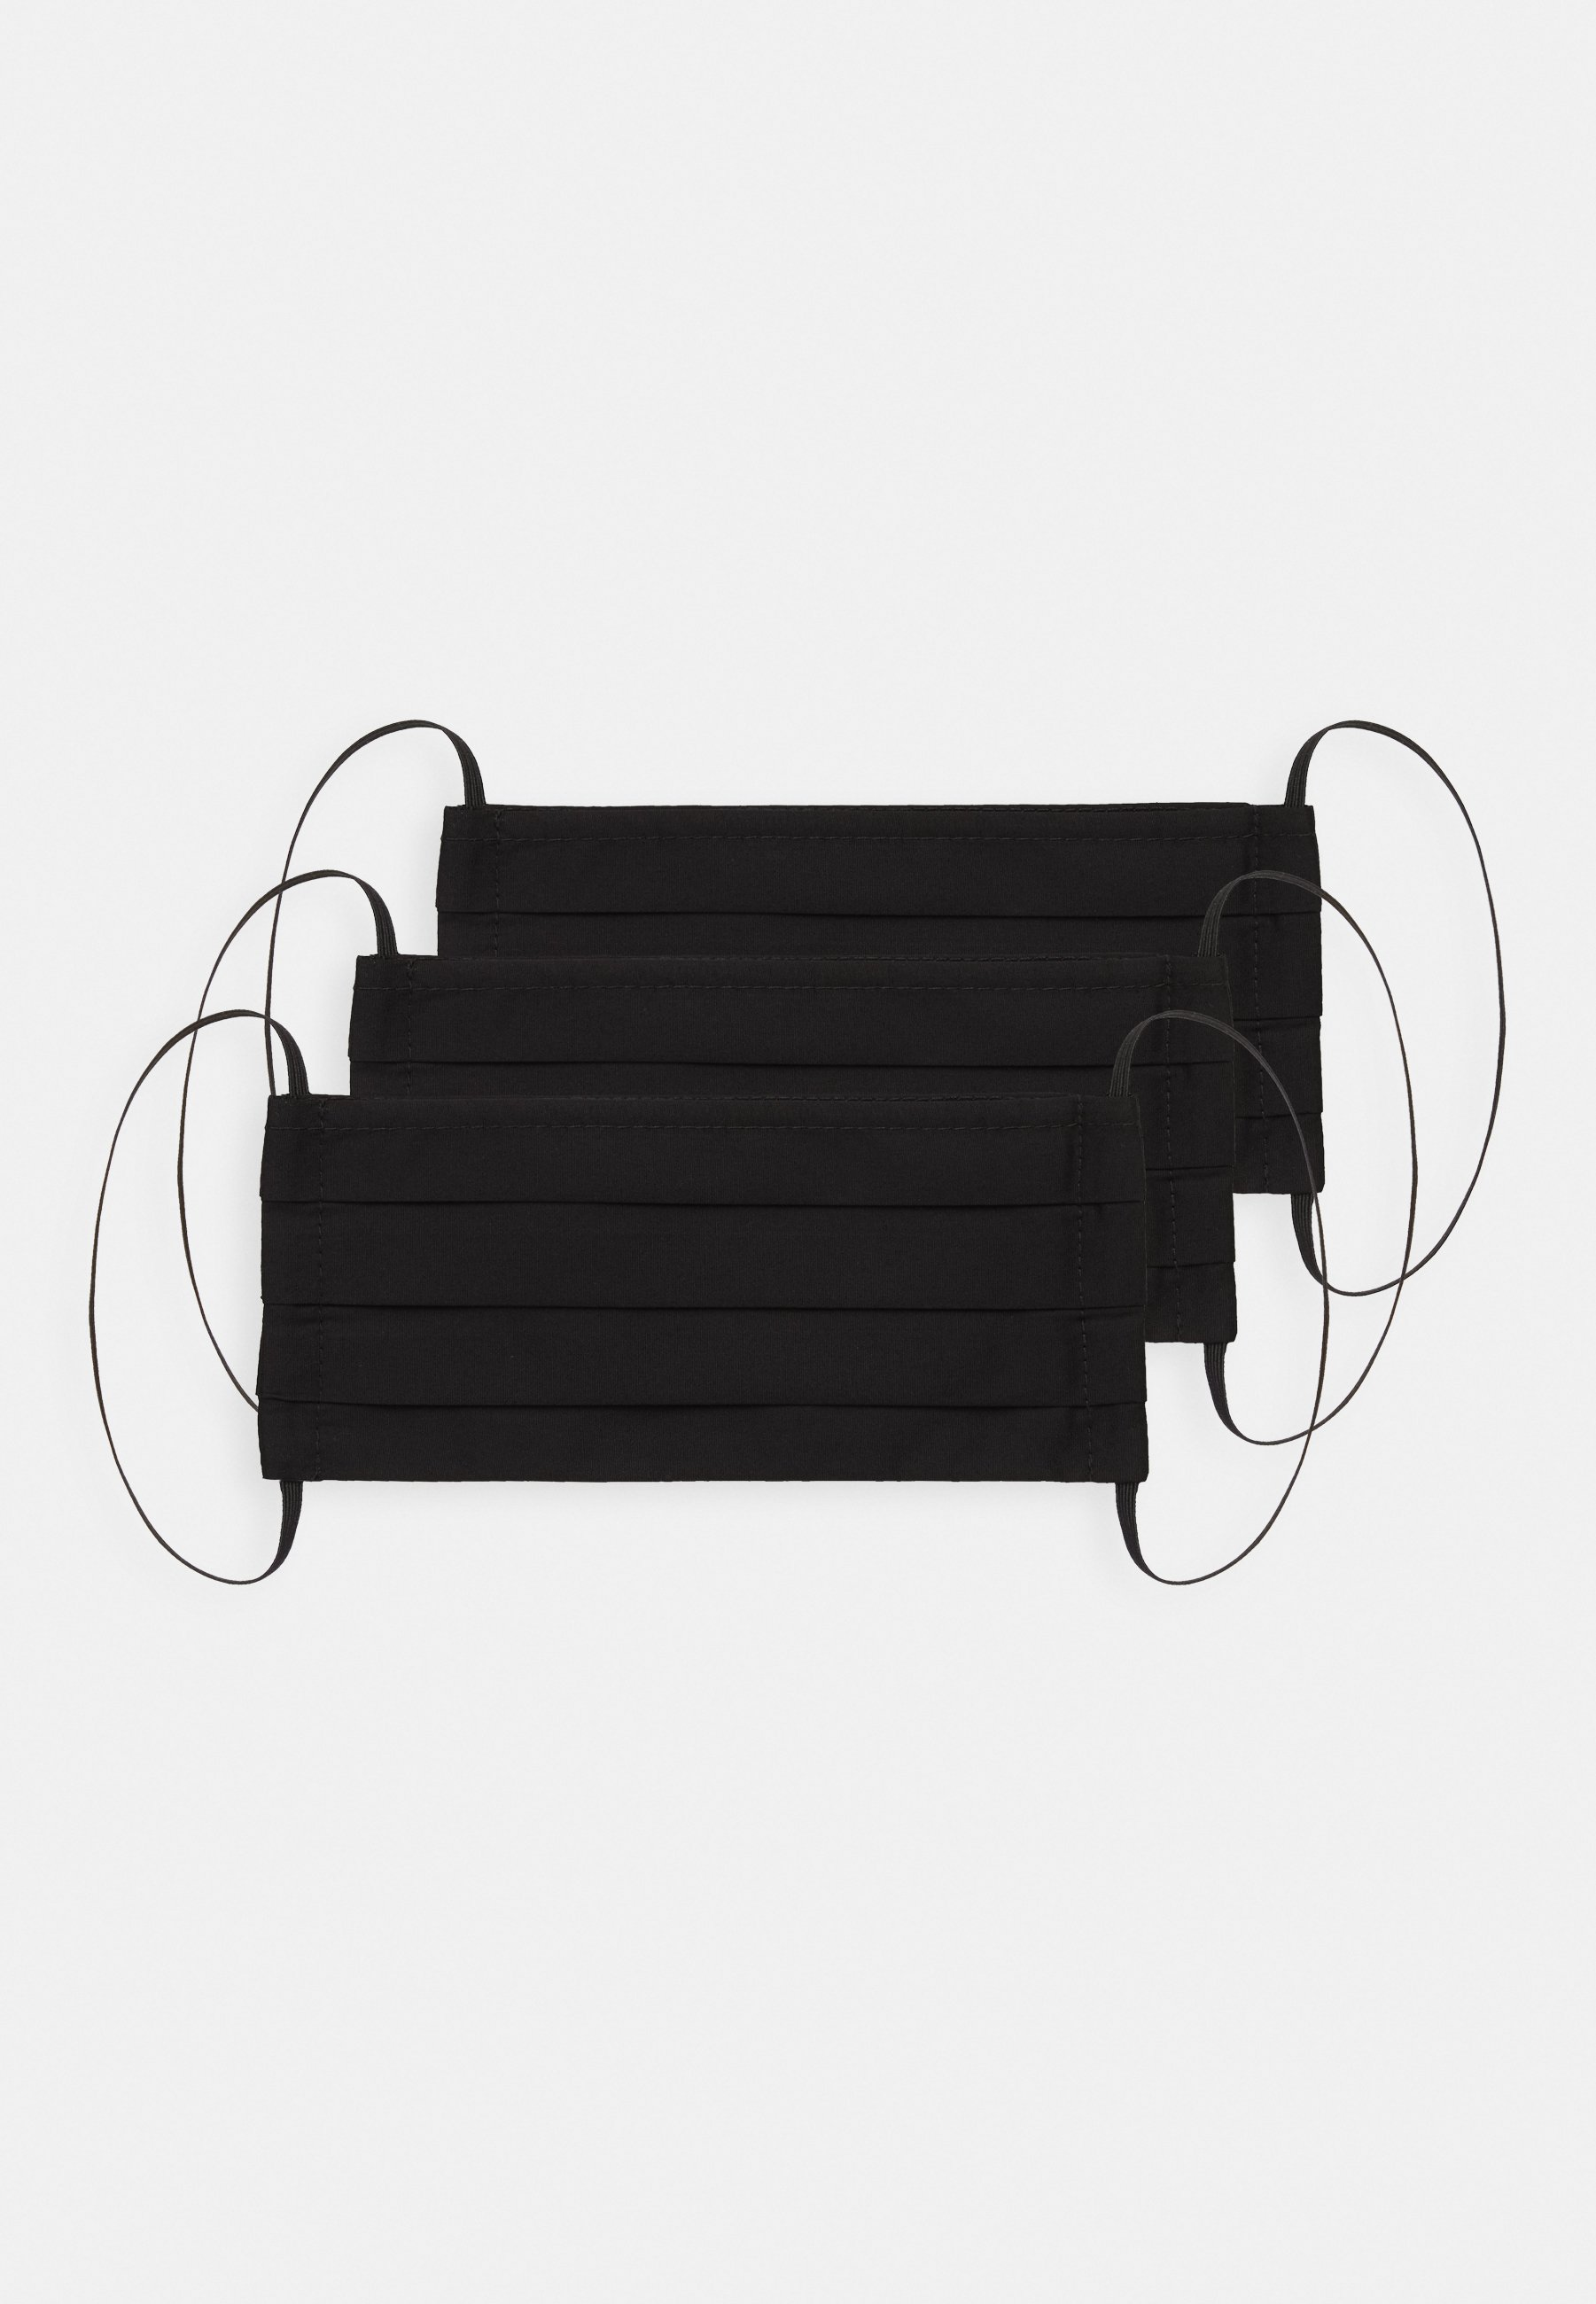 Zign 3 PACK - Munnbind i tøy - black/svart 6aZTwKzVg0exi3k